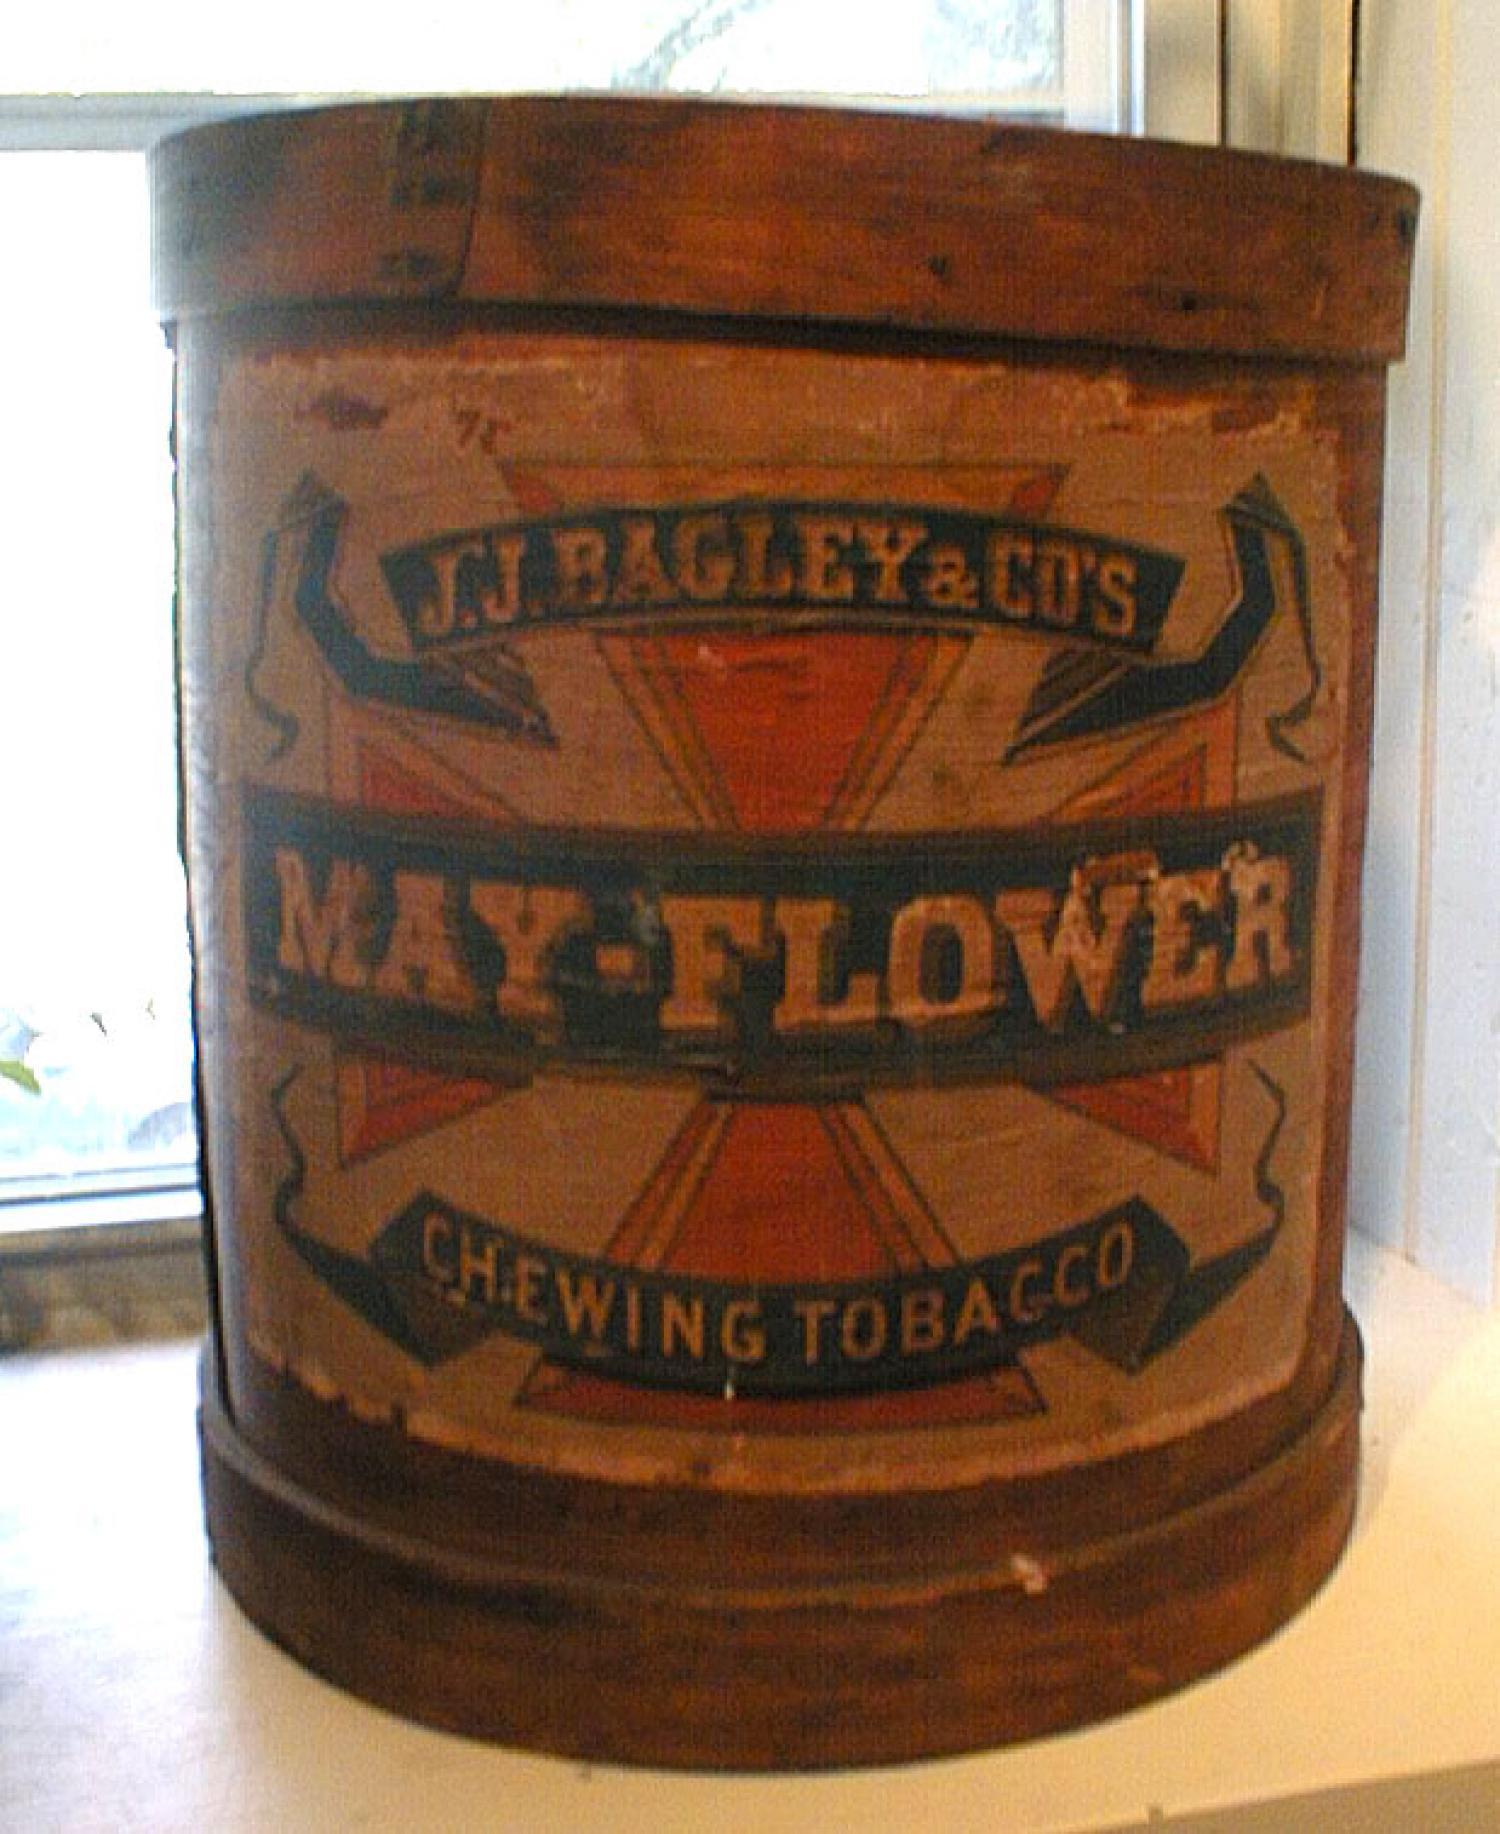 Antique Advertising Mayflower tobacco barrel